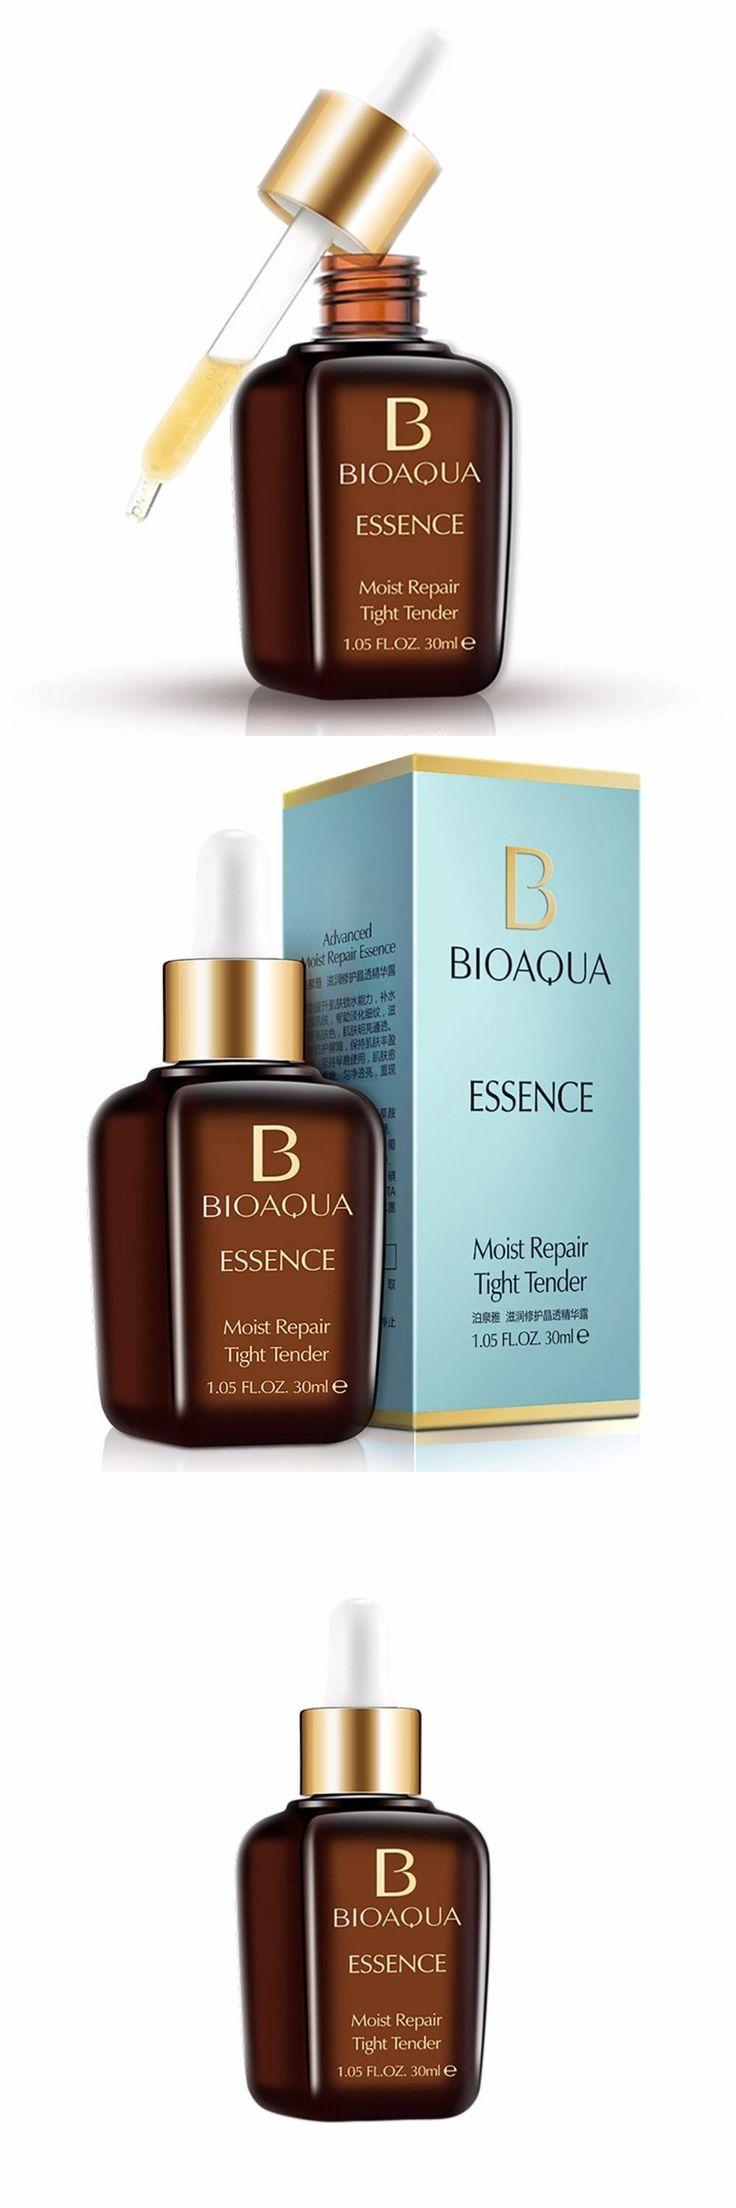 [Visit to Buy] New 30ml Hyaluronic Acid Liquid Anti Wrinkle Serum Skin Care Whitening Moisturizing Day Cream Anti Aging Collagen Essence Oil M3 #Advertisement